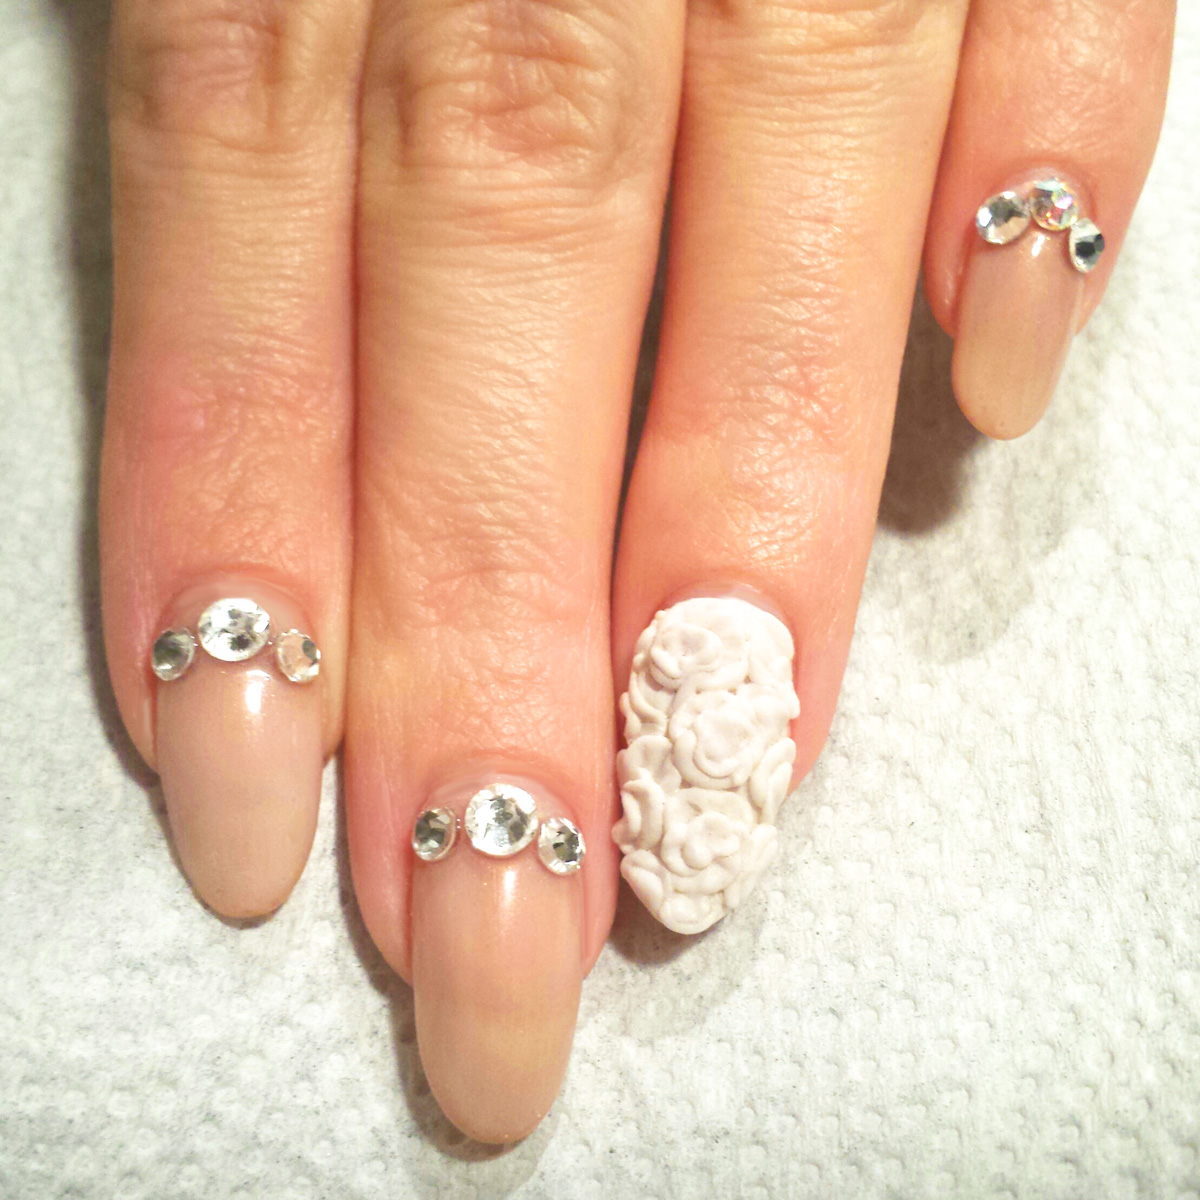 Best Nail Designs And Tutorials: 20 Best Acrylic Nails Tutorials